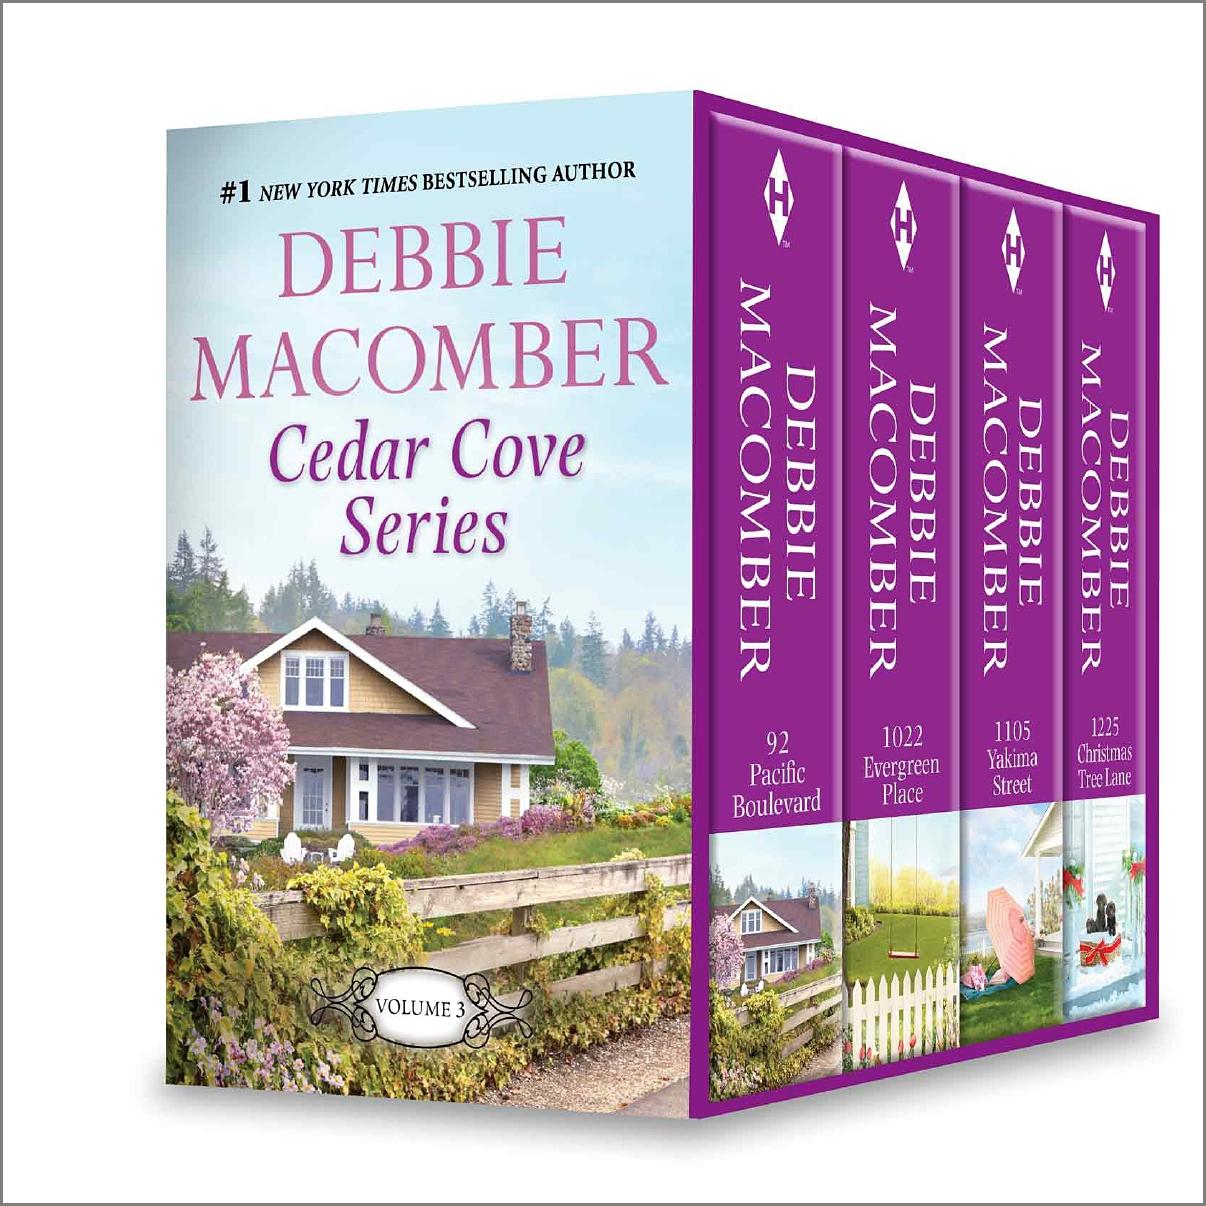 Debbie Macomber's Cedar Cove Vol 3 92 Pacific Boulevard\1022 Evergreen Place\1105 Yakima Street\1225 Christmas Tree Lane